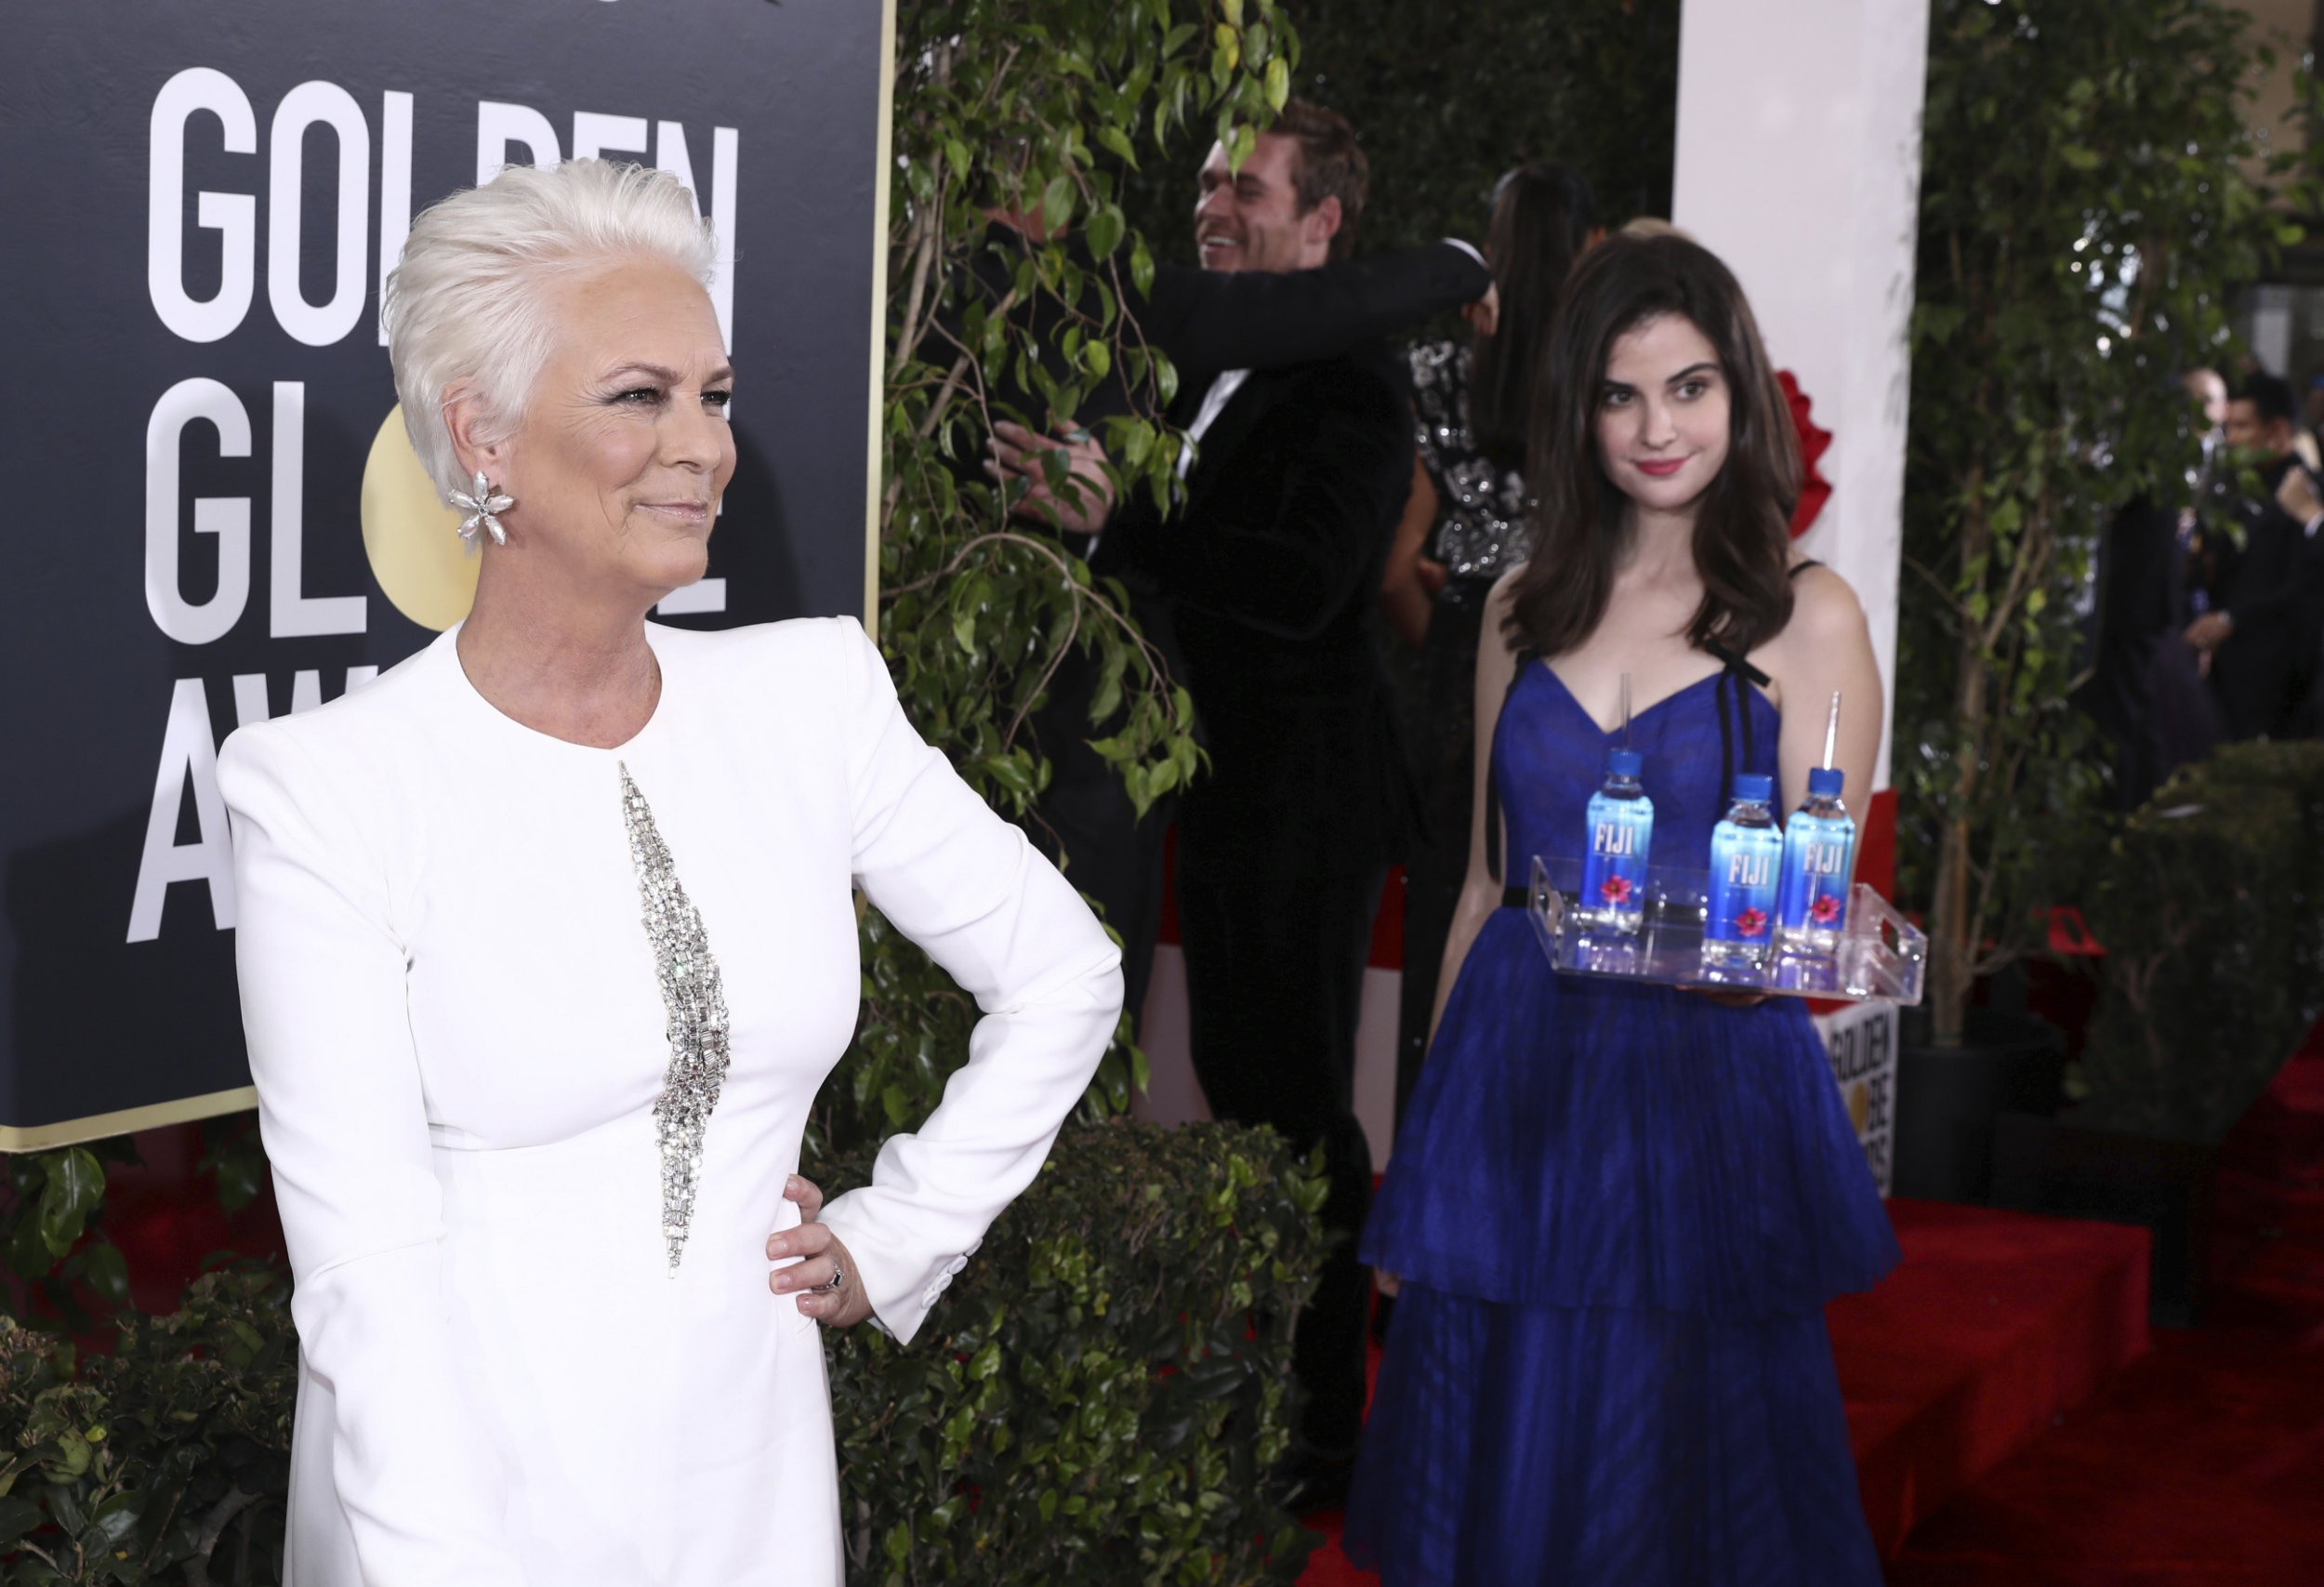 Fiji Water Girl isn't loved by everyone as Jamie Lee Curtis rages over viral PR stunt